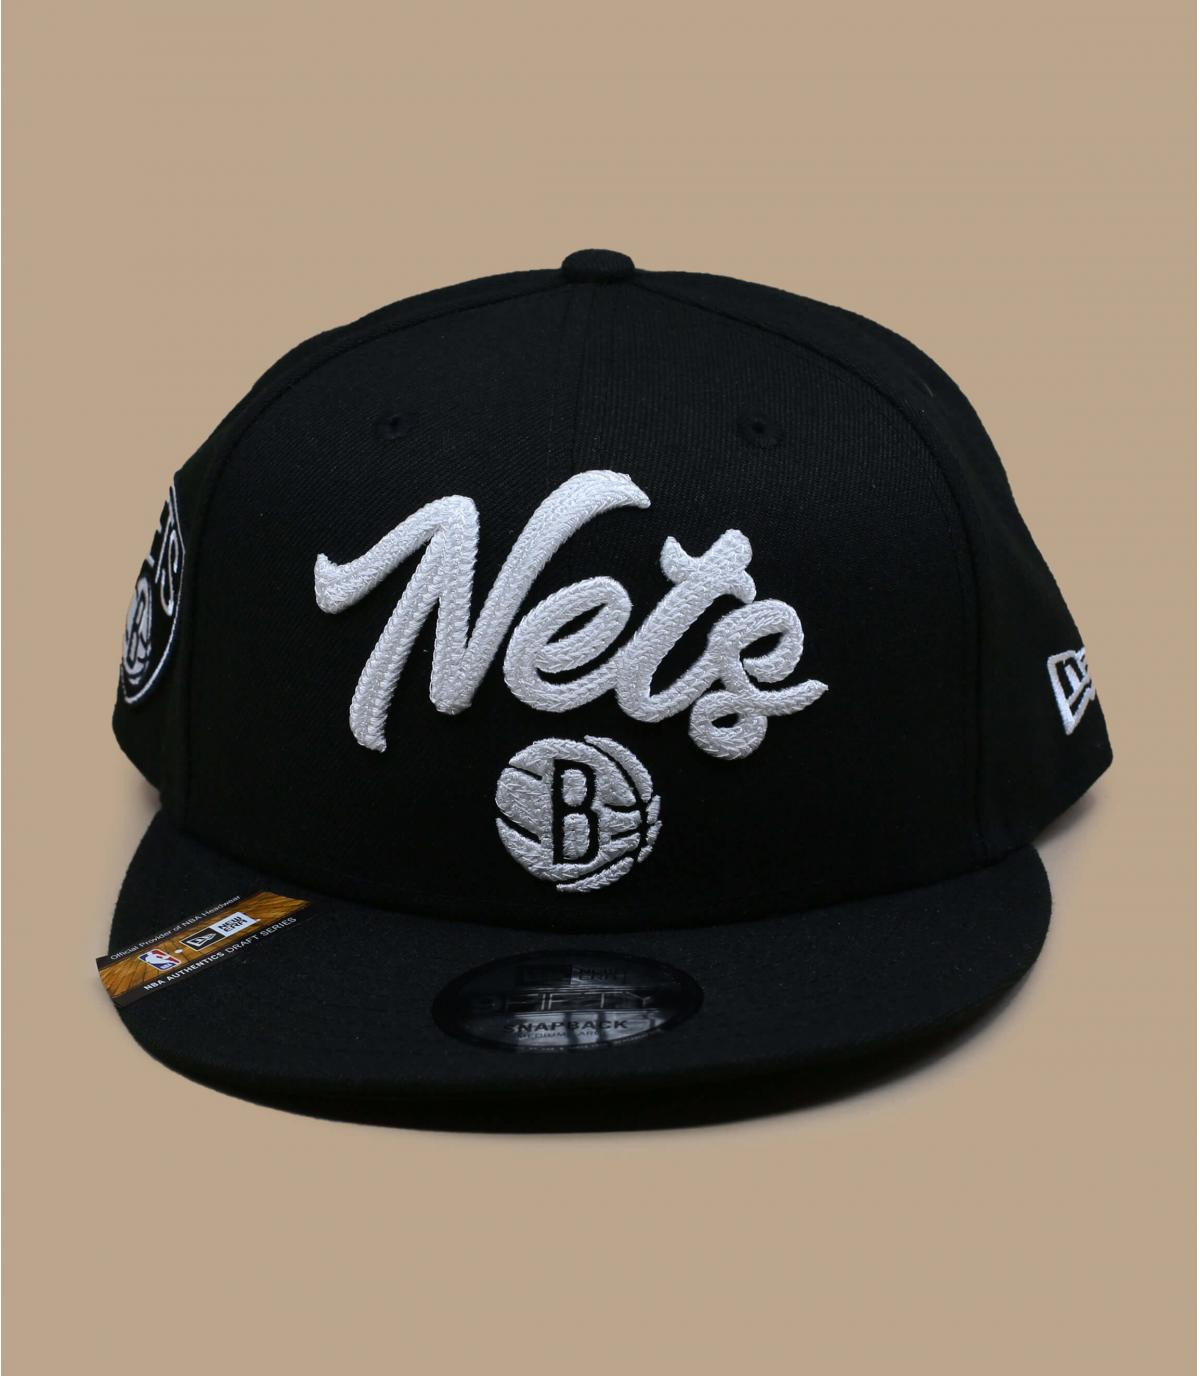 Détails Snapback NBA Draft Nets 950 - image 2